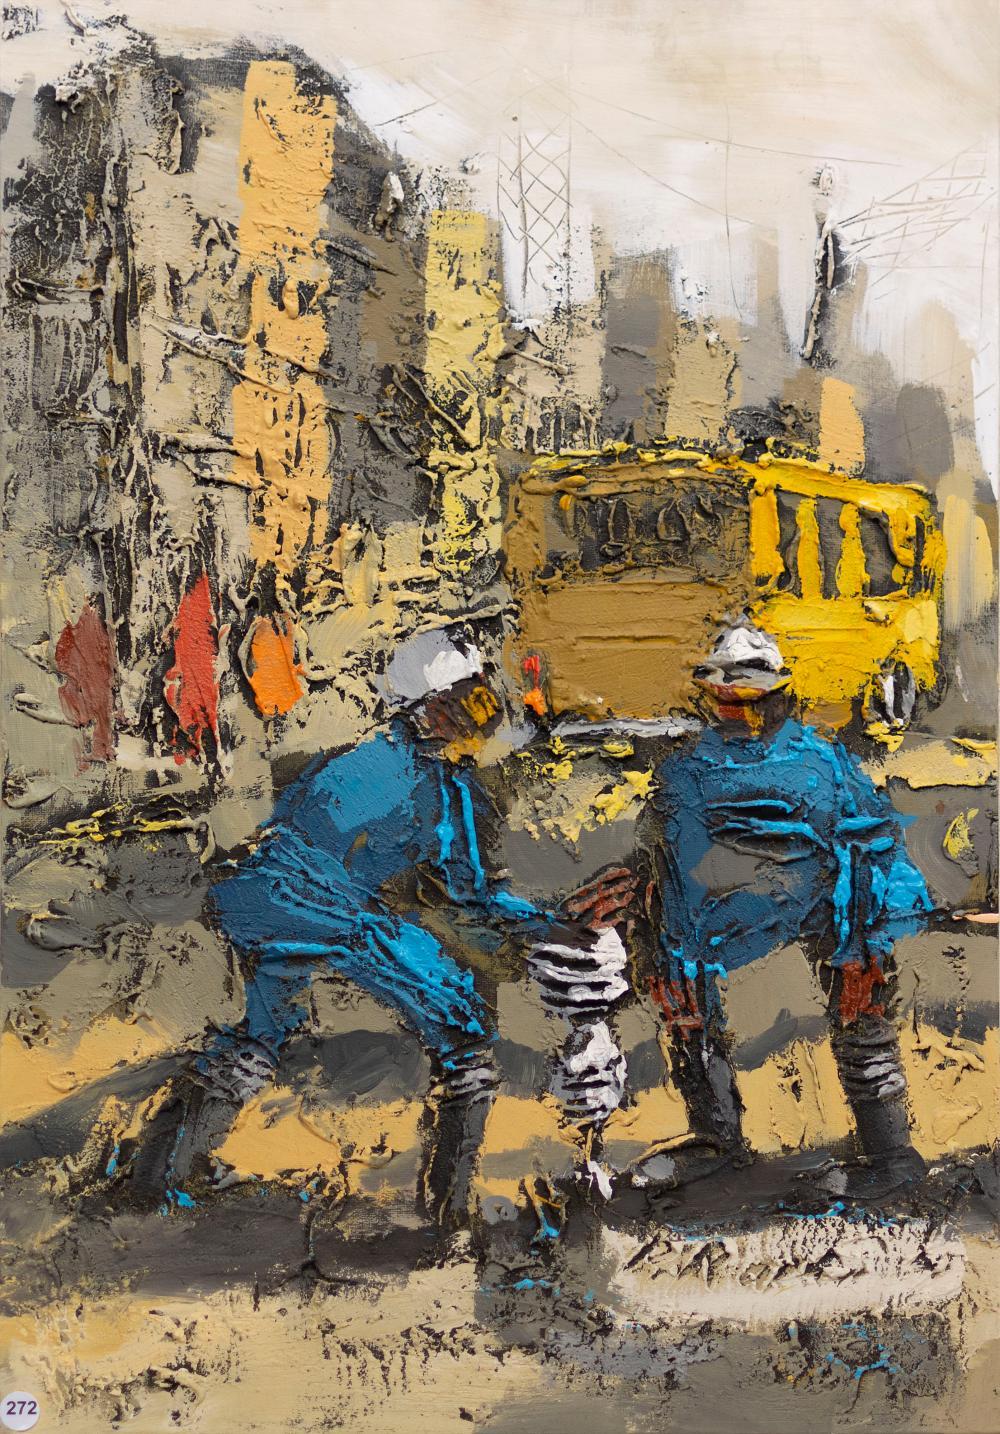 Patrick Rapai (Zimbabwean, Born 1976) Oil, Roadworks, Signed, 76 x 51 unframed